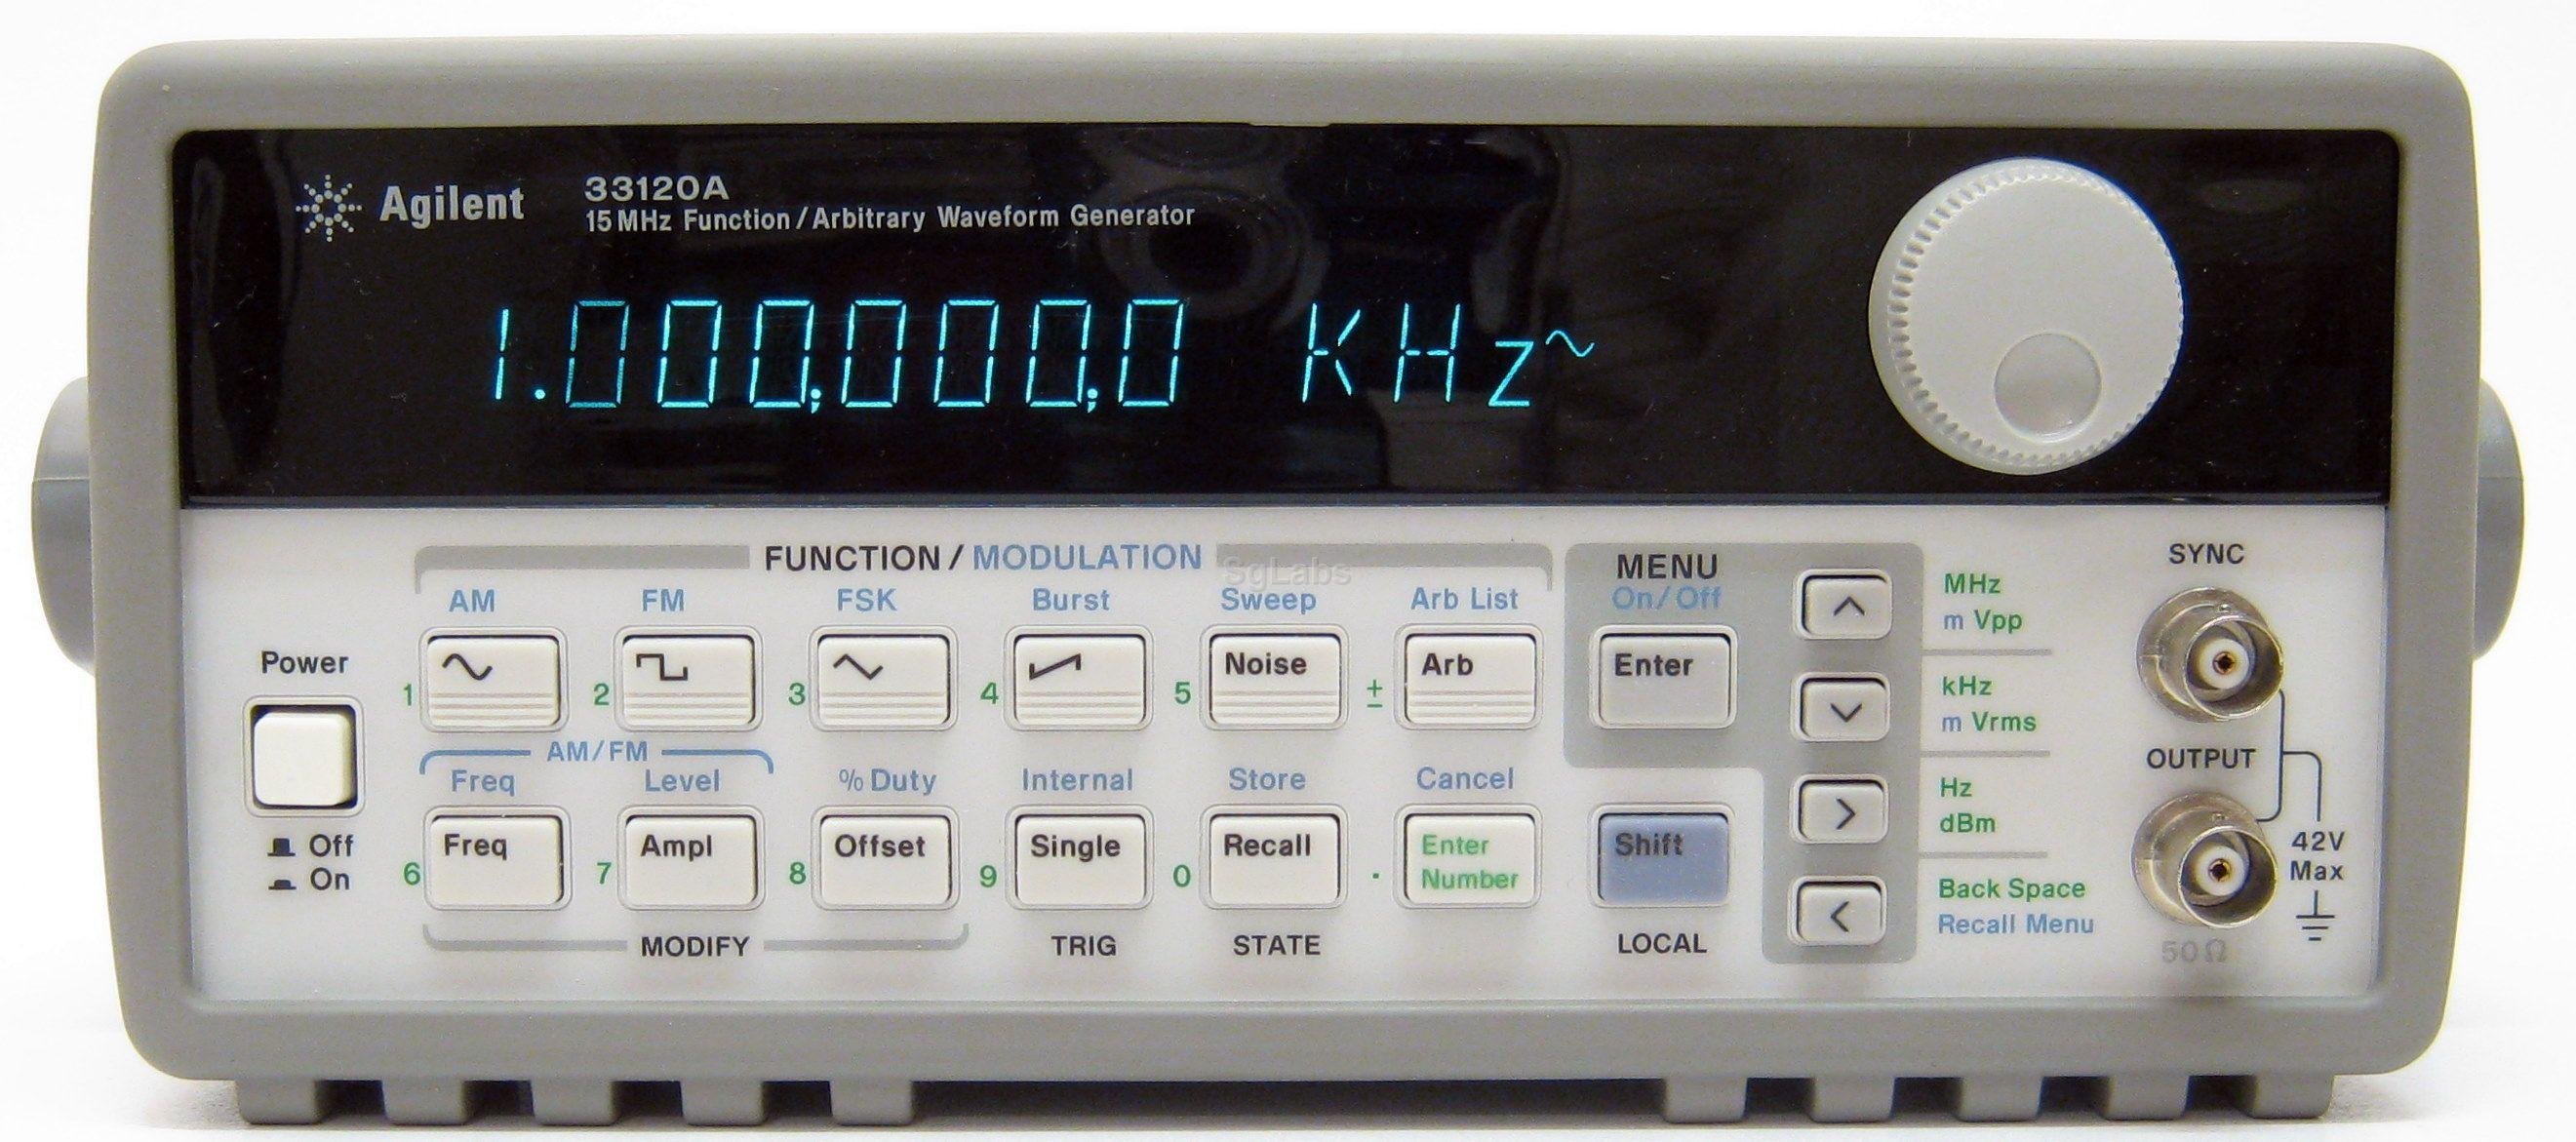 hp agilent keysight 33120a rh sglabs it HP Waveform Generator Hewlett-Packard 33120A Manual